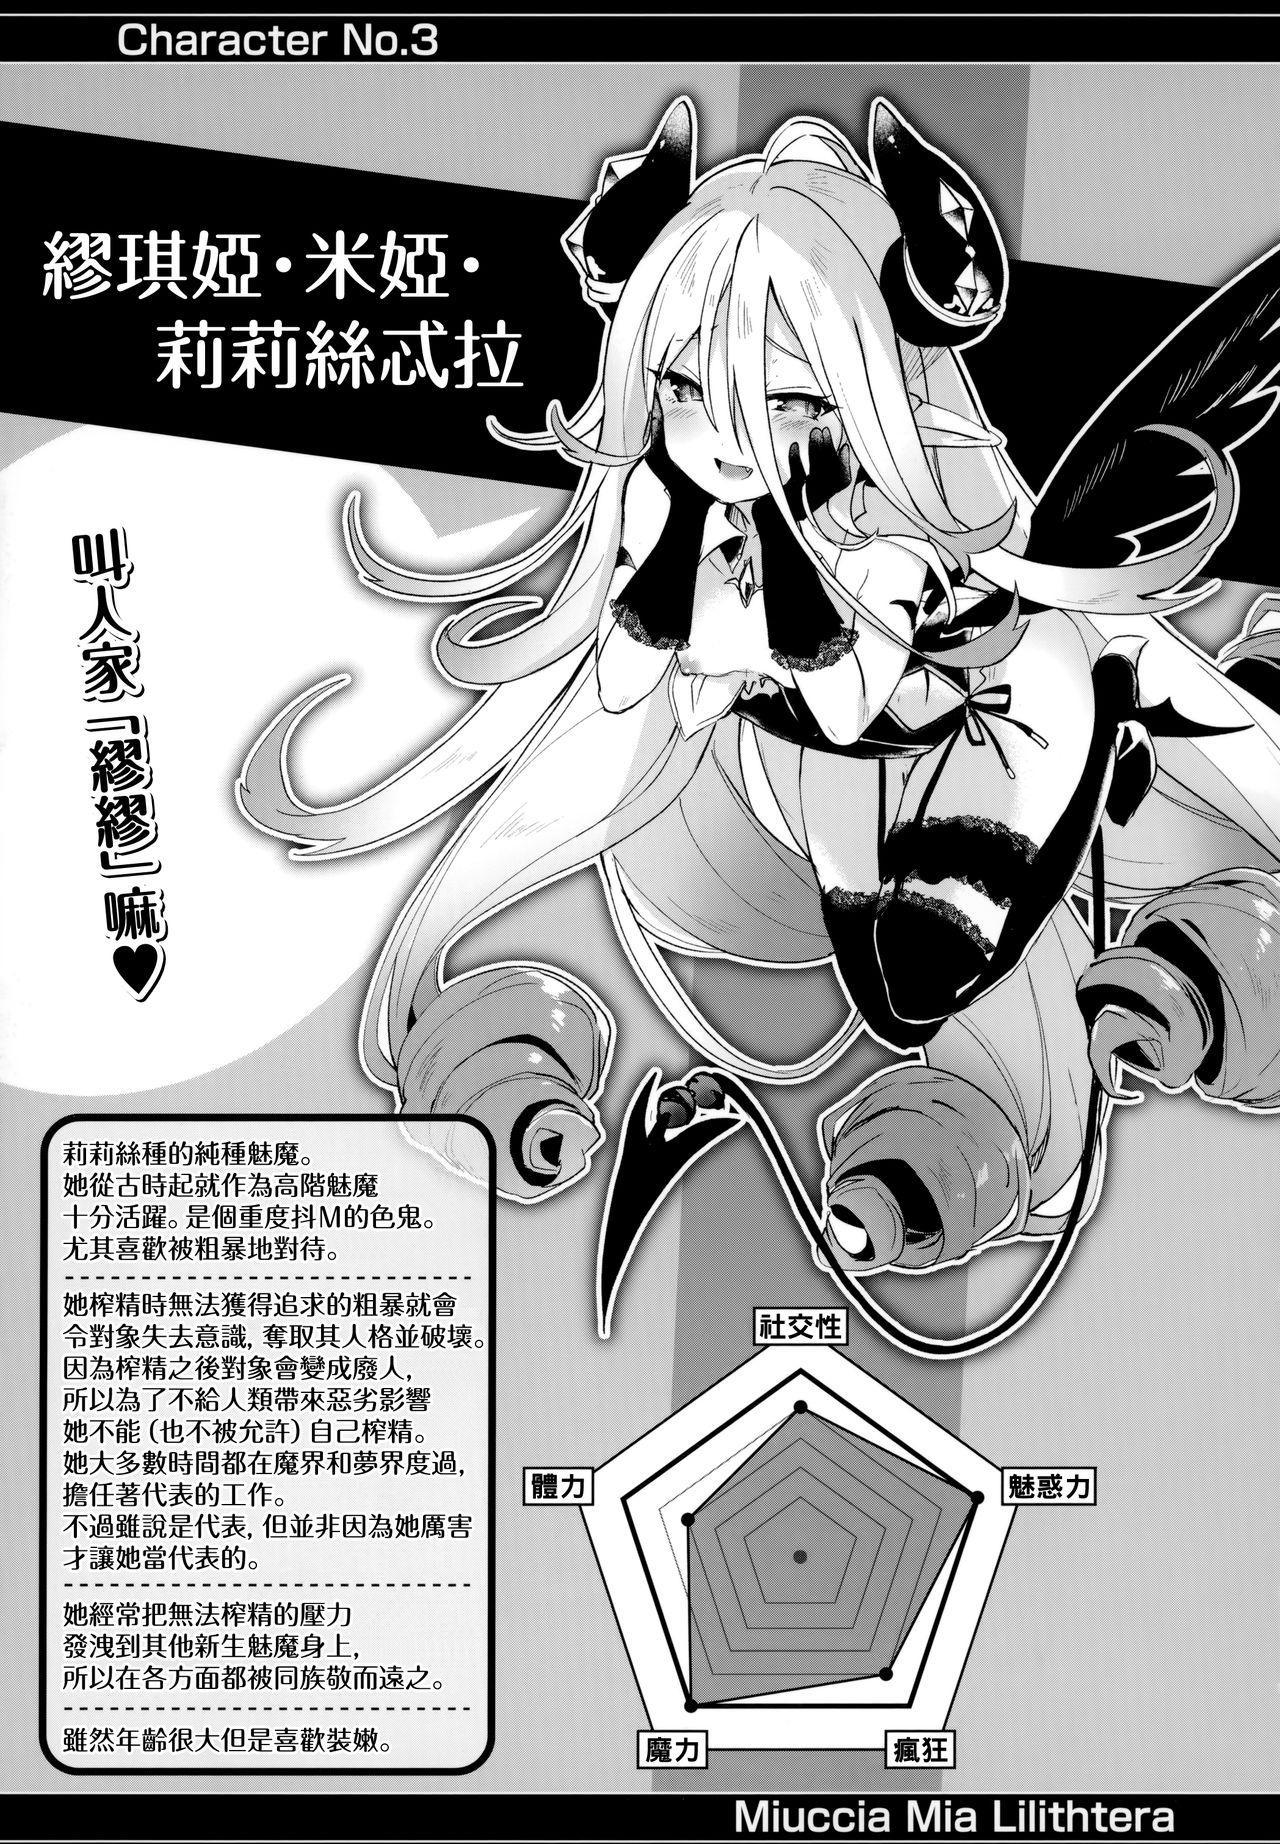 Boku wa Chiisana Succubus no Shimobe - I am a slave of a small succubus 175